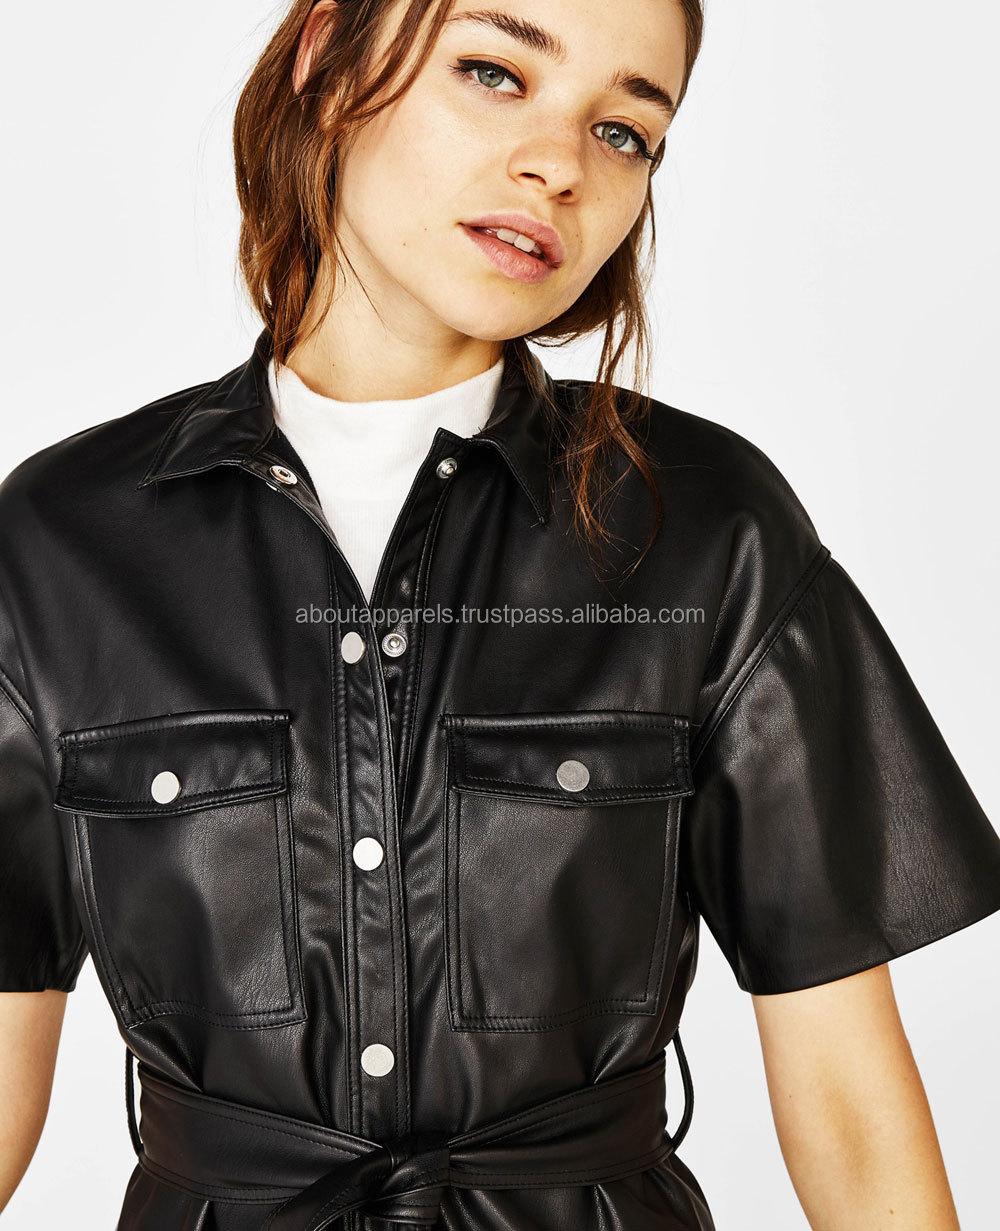 2018 new design fashion custom wholesale slip summer midi black sleeveless dresses, New Black Faux Leather Shirt Dress,